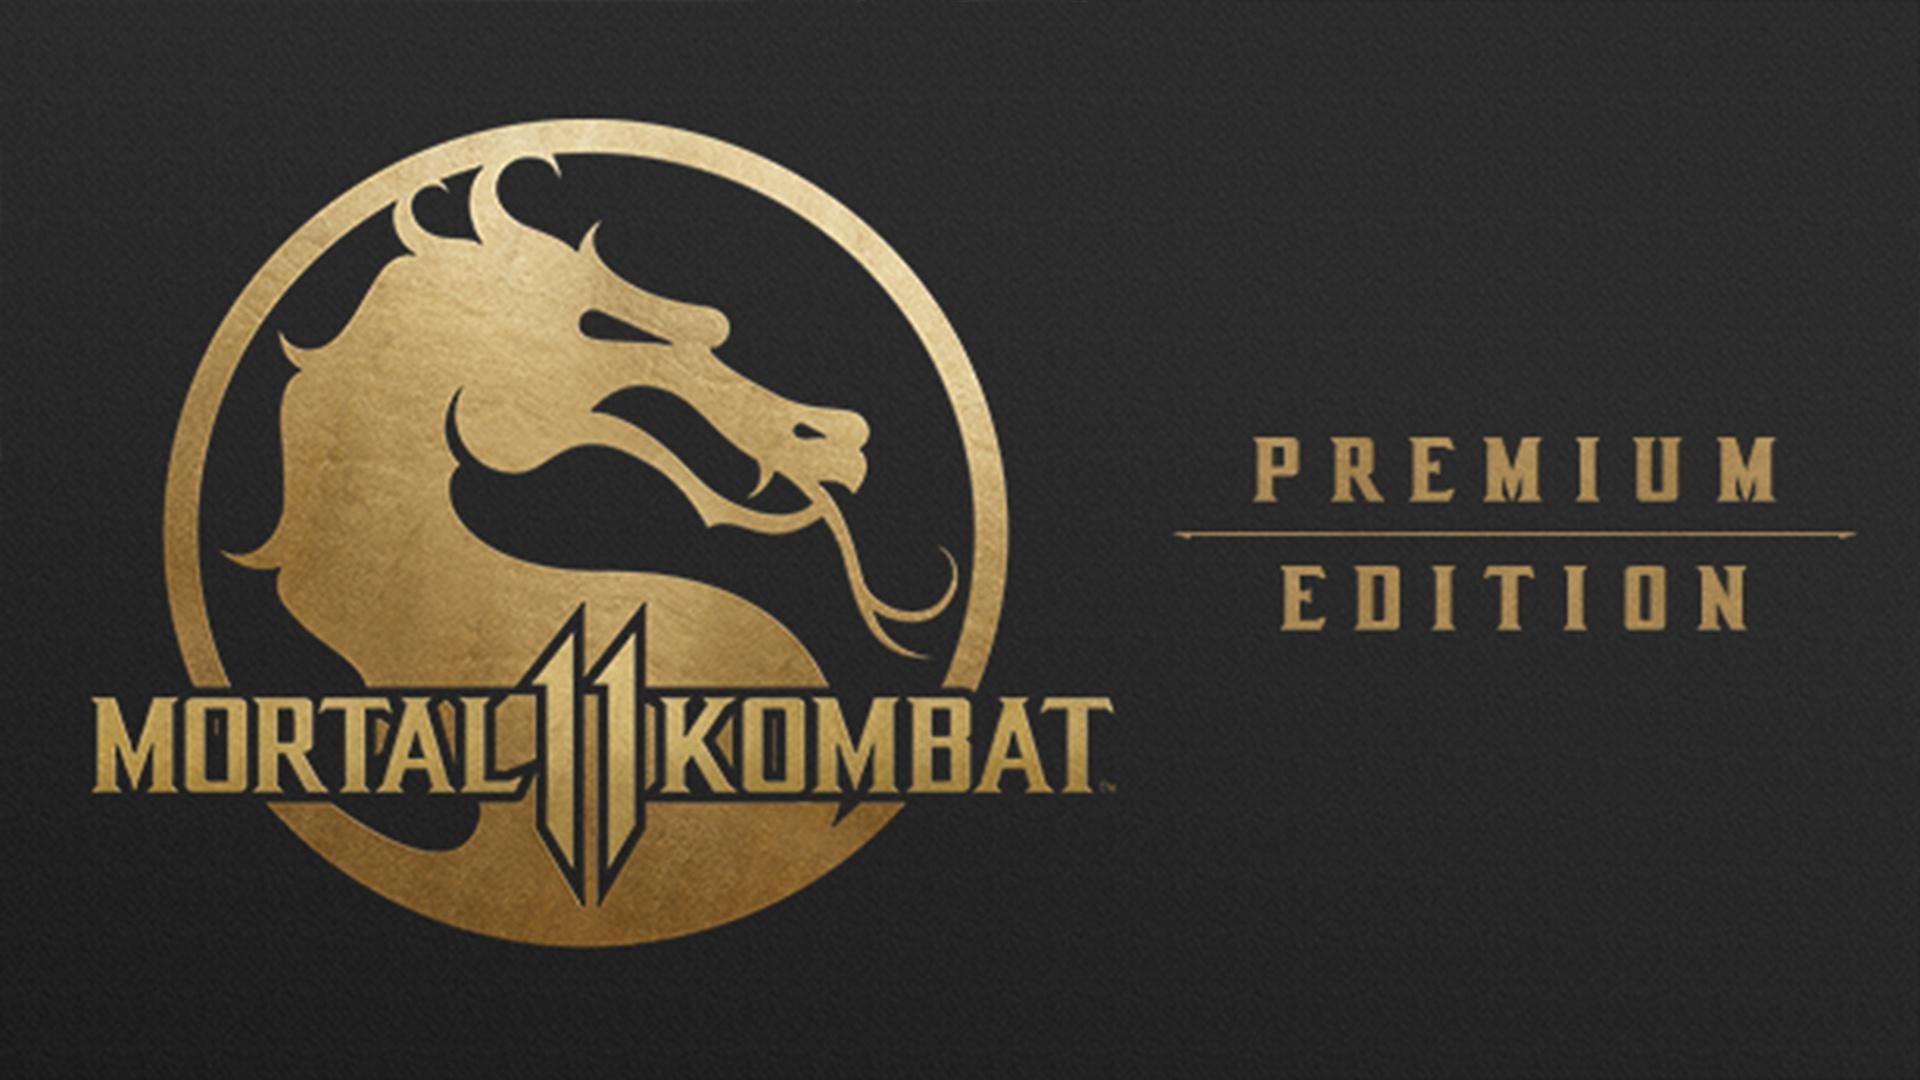 Mortal Kombat 11 - Premium Edition | PC Steam Game | Fanatical